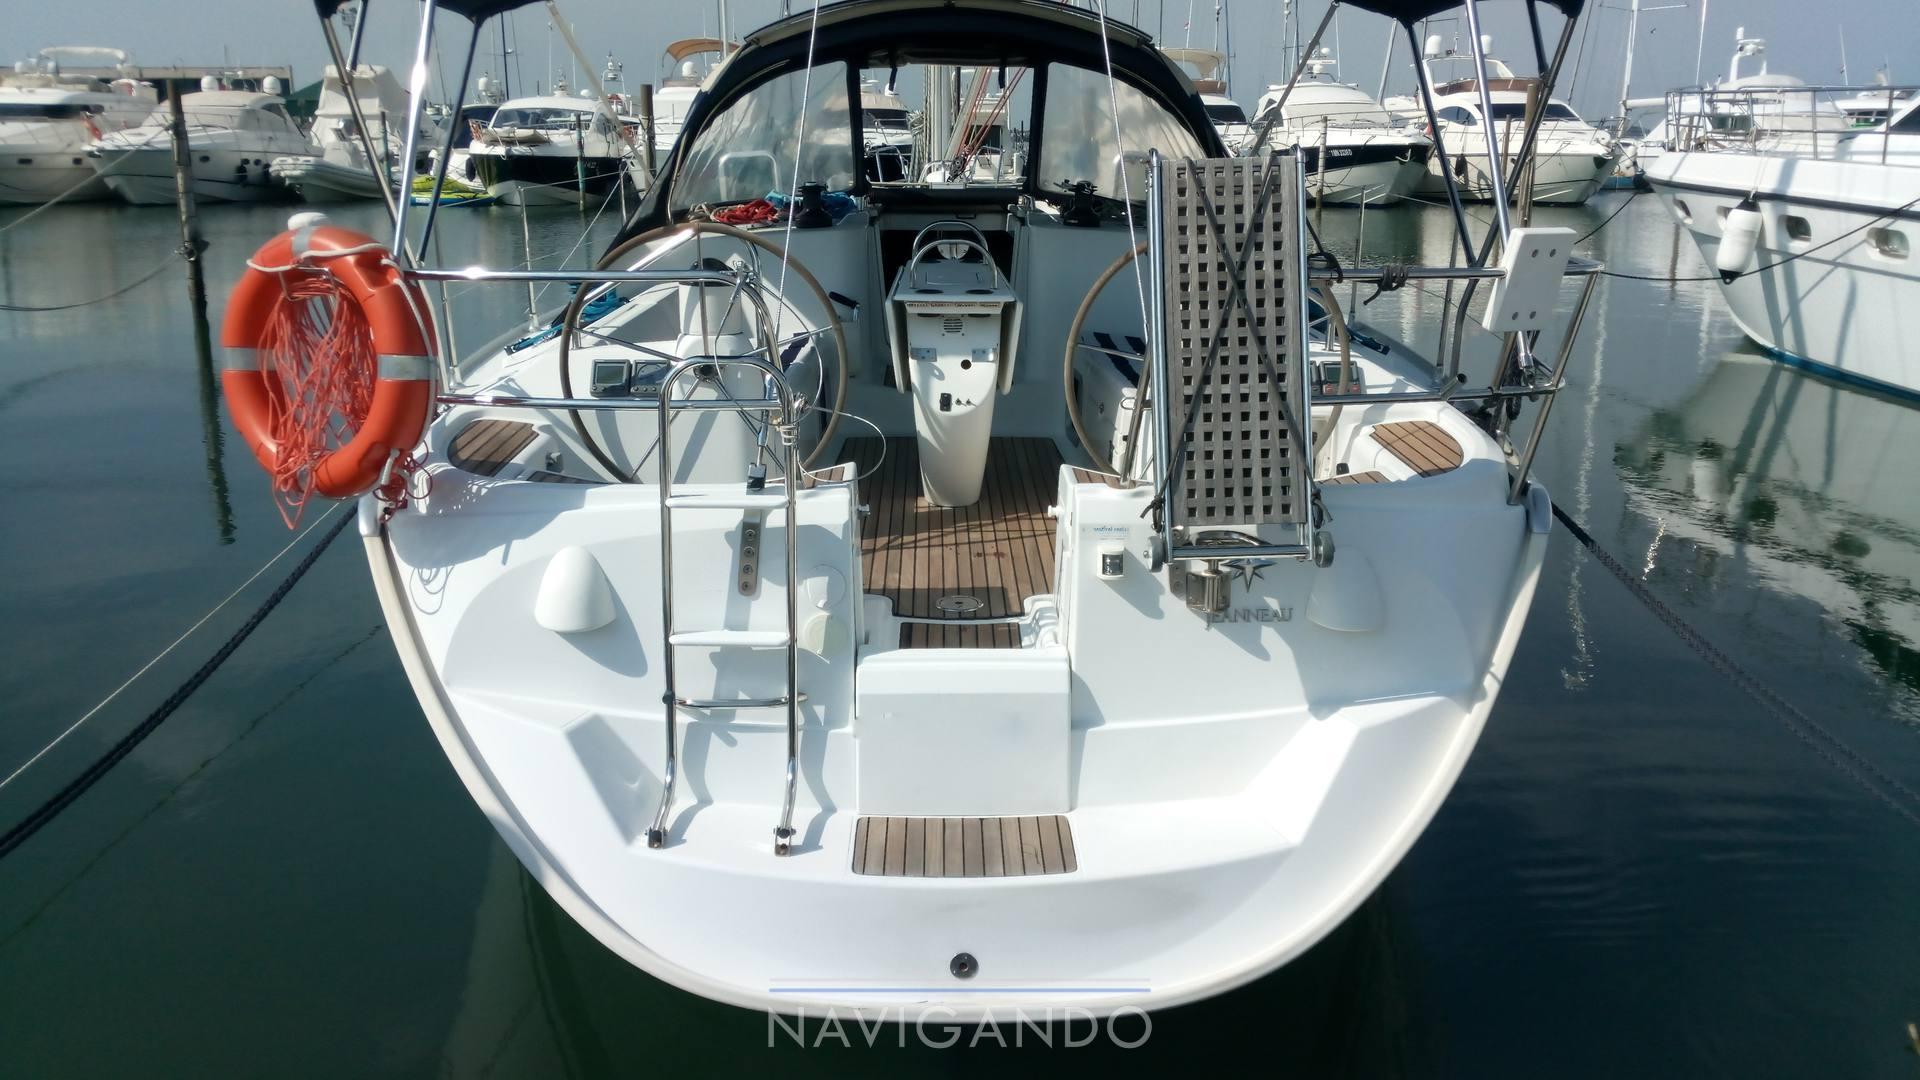 Jeanneau Sun odyssey 40.3 Парусная лодка используется для продажи